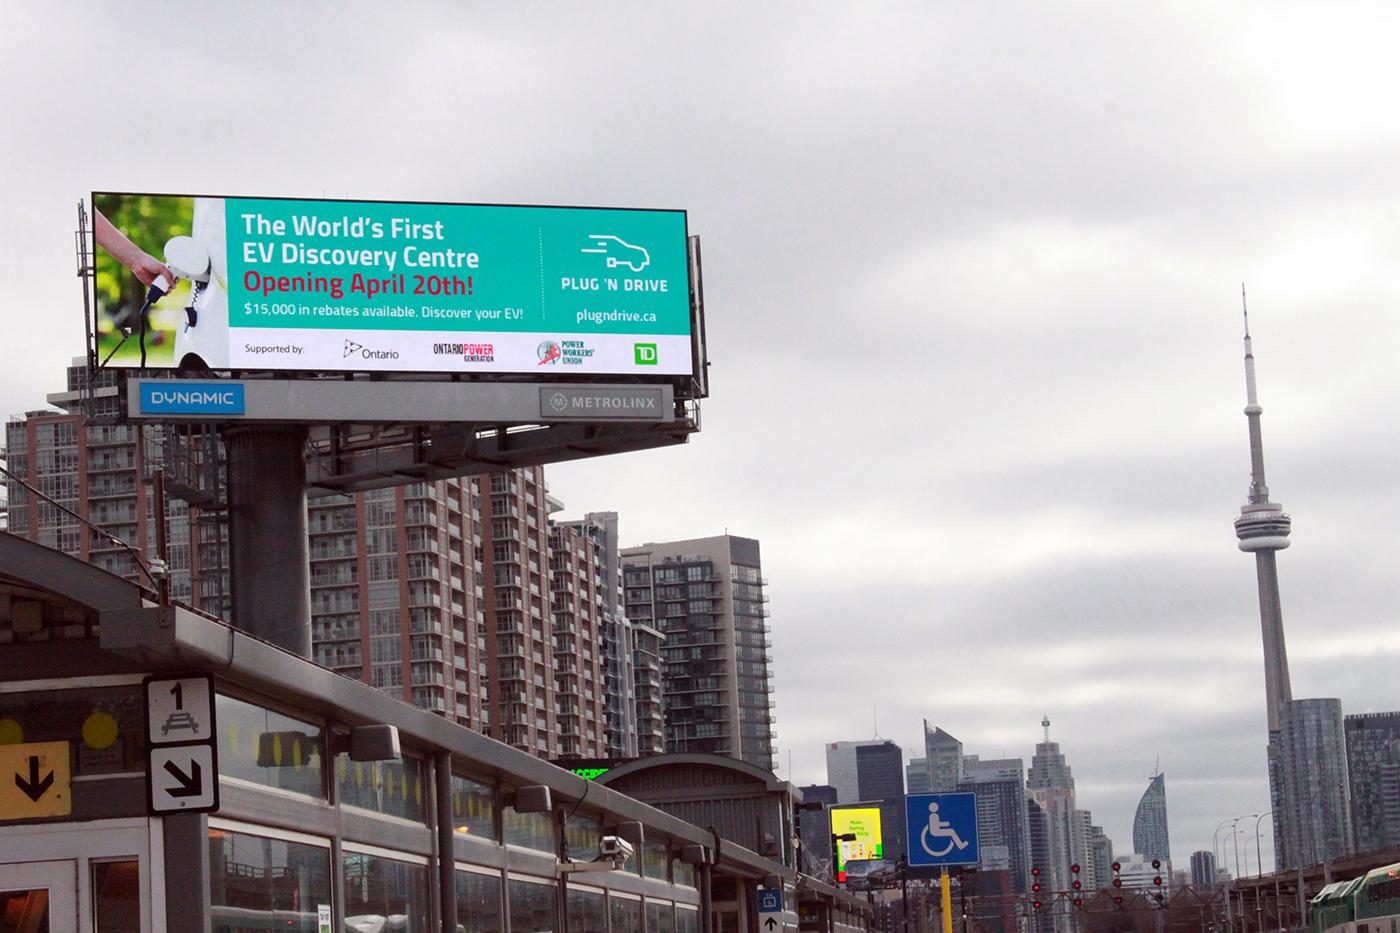 Plug'n Drive billboard